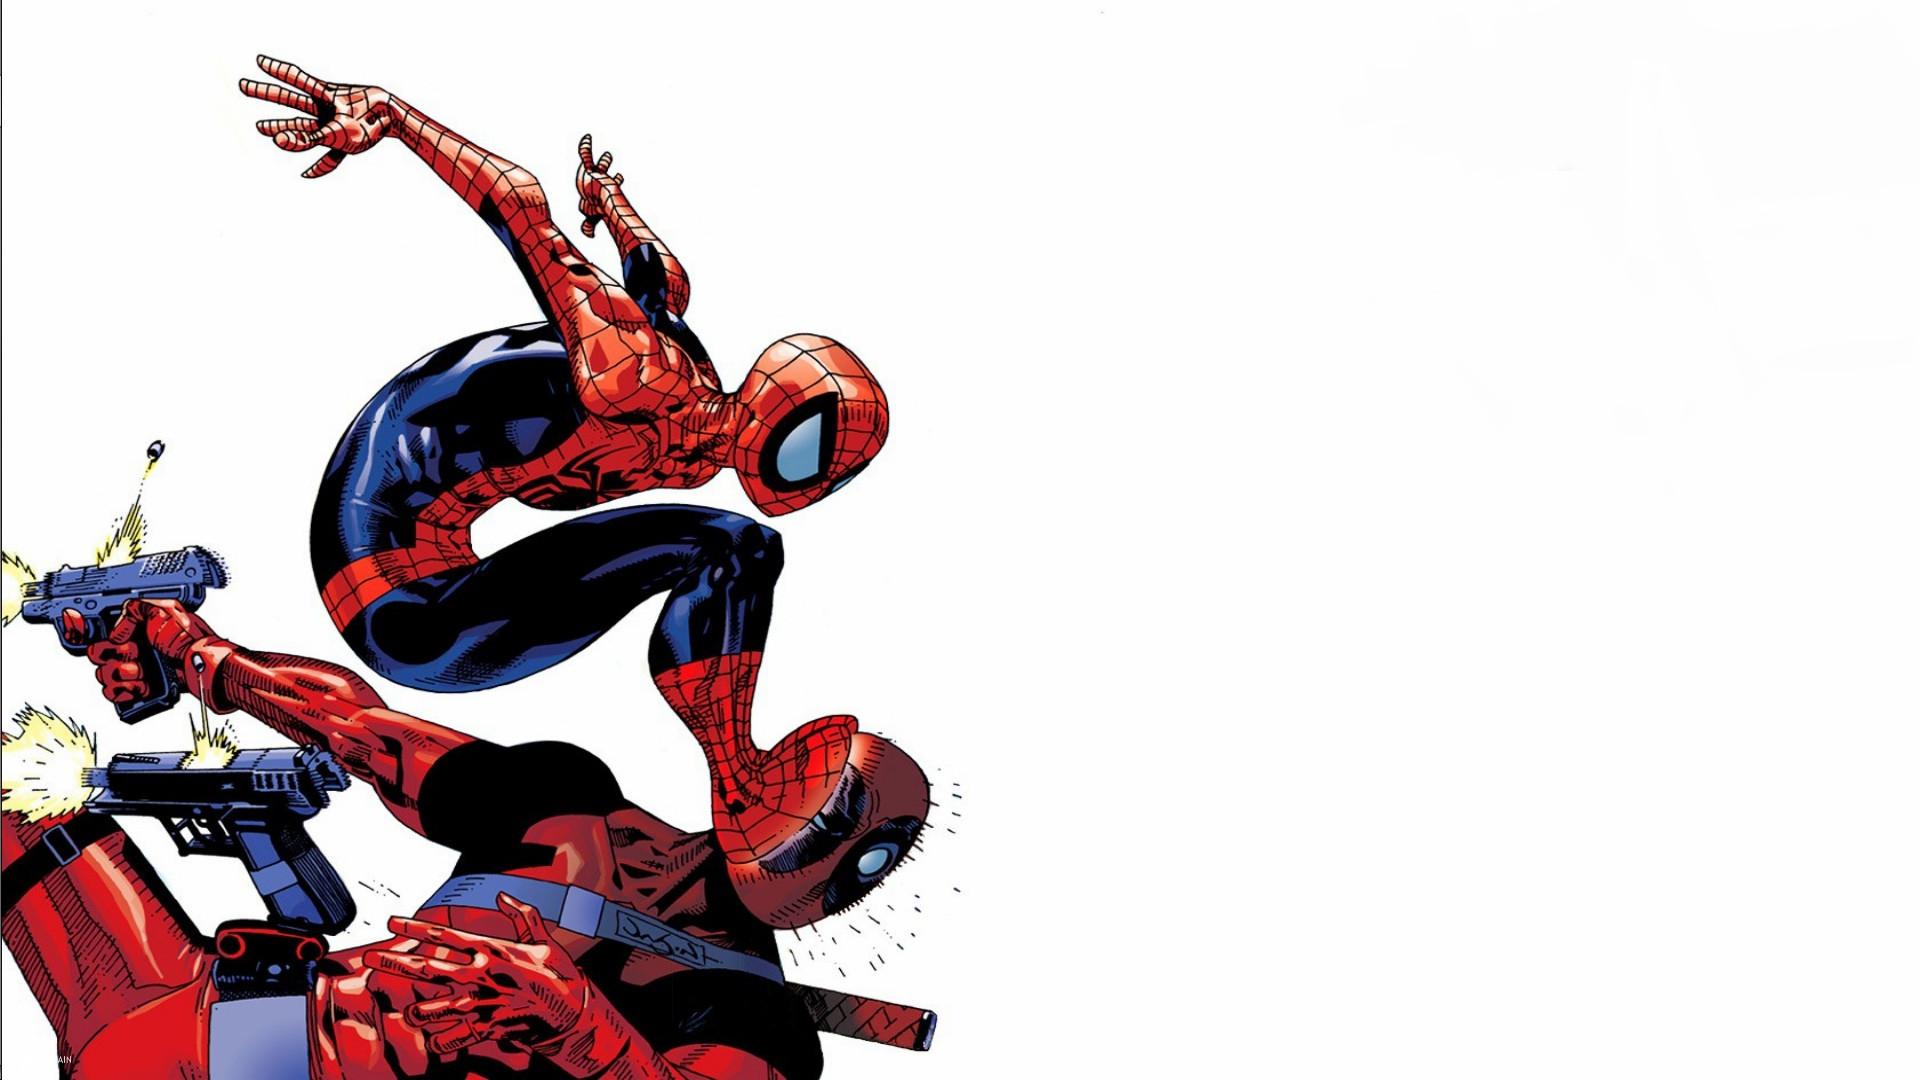 Comics Deadpool: Monkey Business Deadpool Merc With A Mouth Spider-Man  Wallpaper